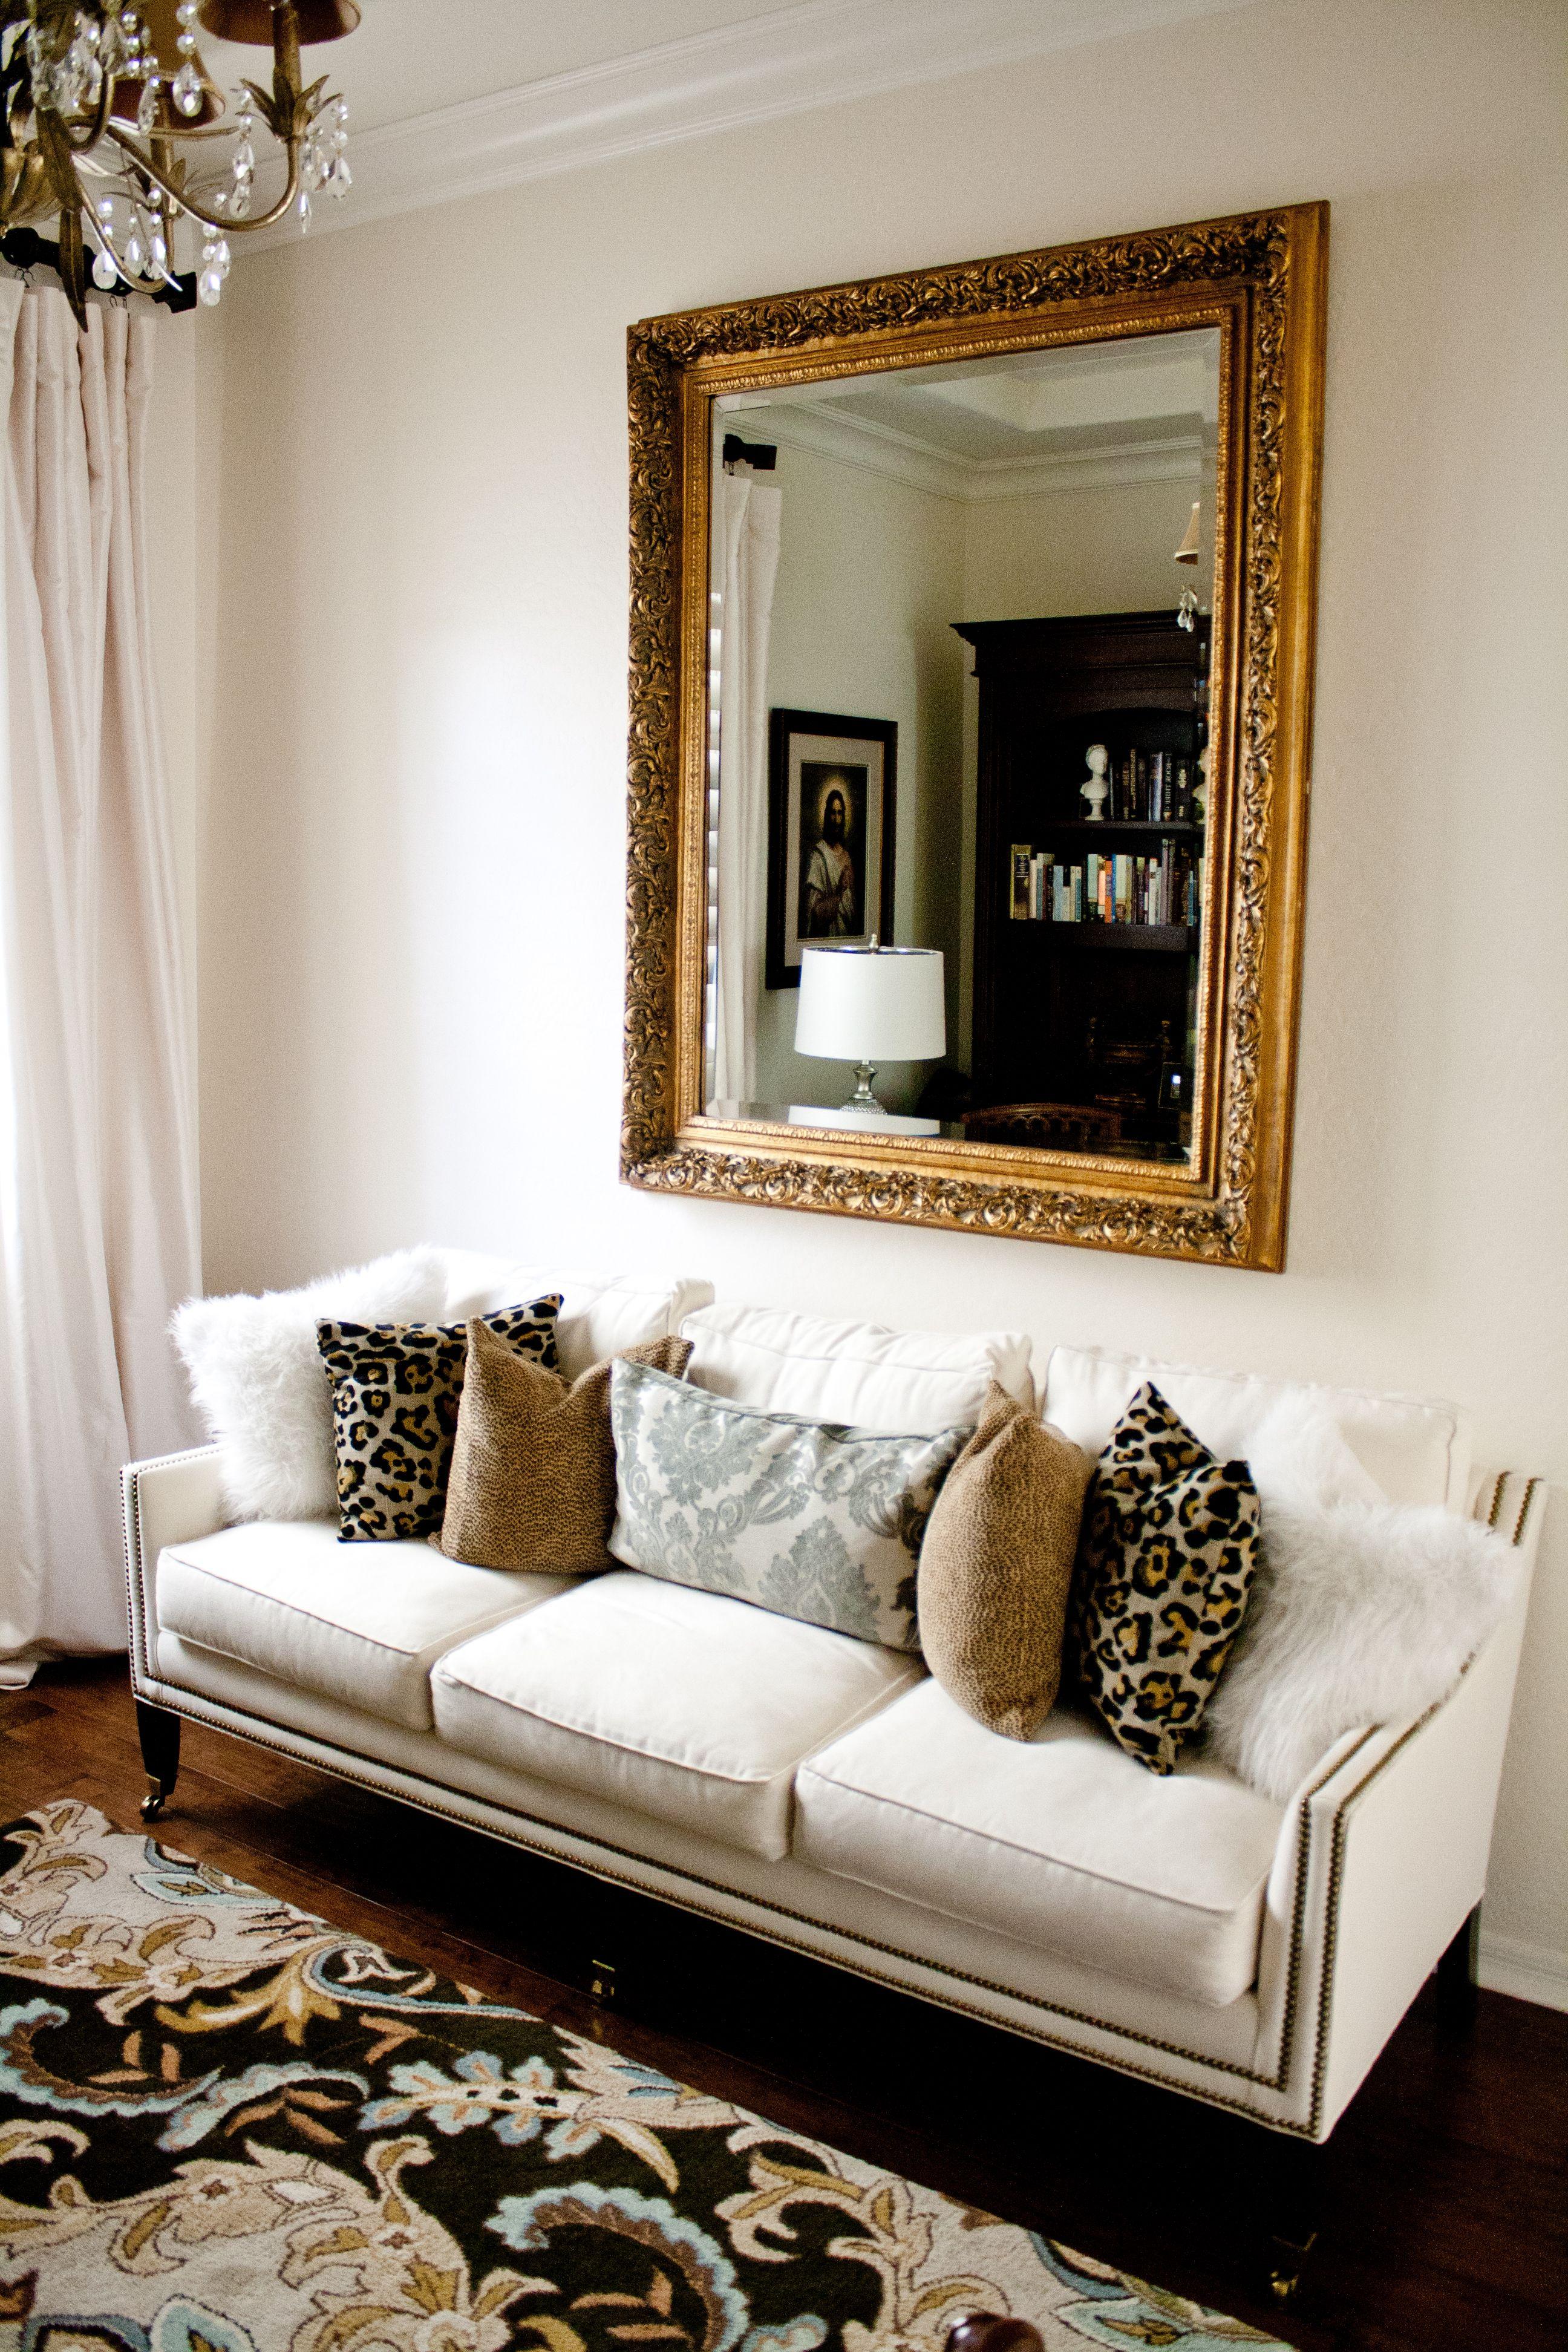 efdf96bc7c8 Den with white sofa gold antique mirror leopard pillows white walls antique  chandelier fur pillows jpg